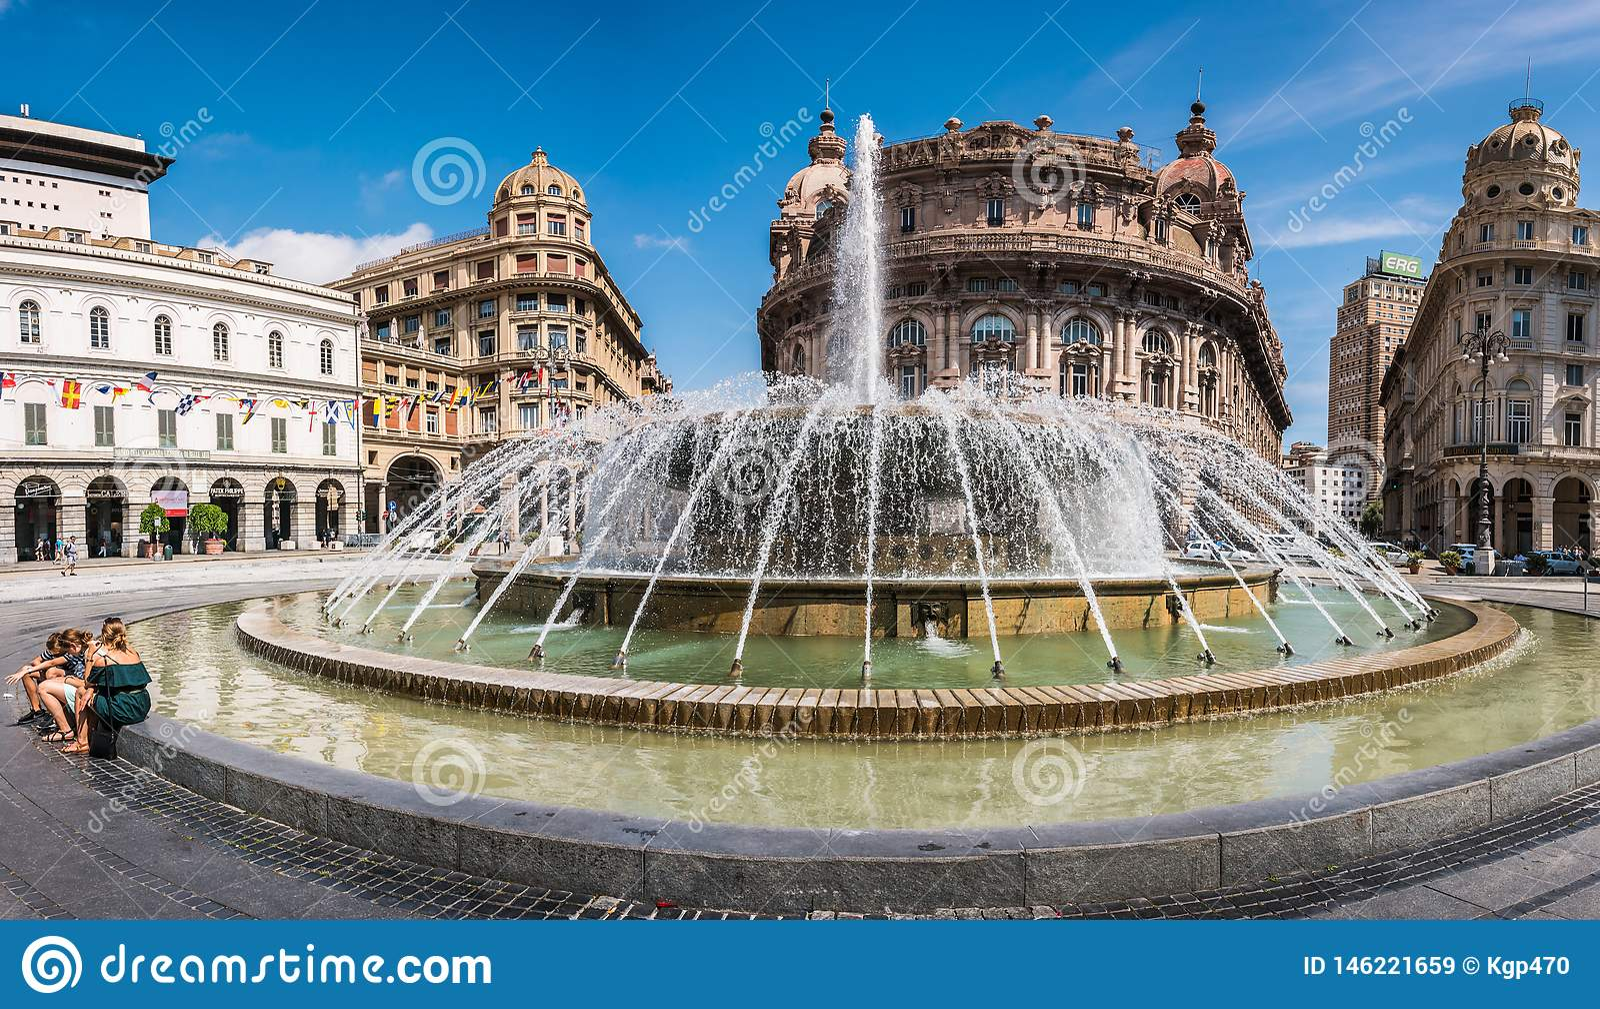 Fountain on Piazza Raffaele de Ferrari in Genoa - the heart of the city, Liguria, Italy